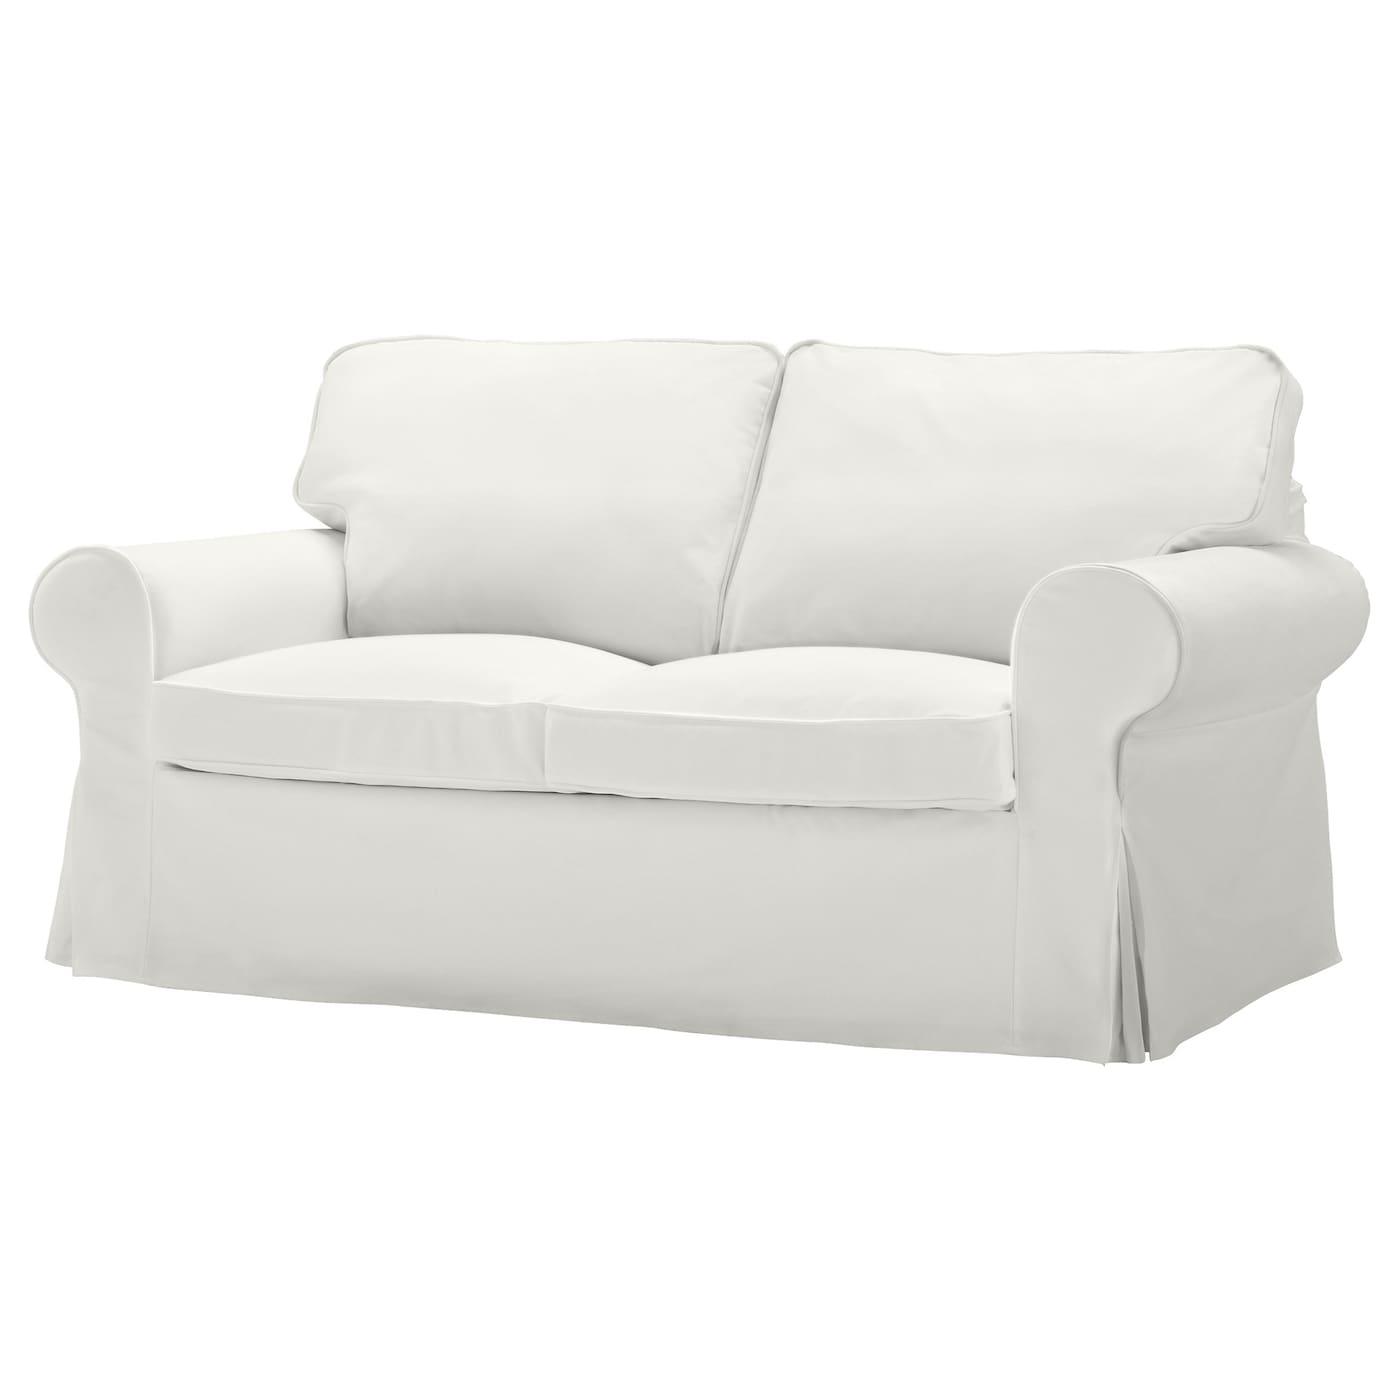 Rp Blekinge White Cover Two Seat